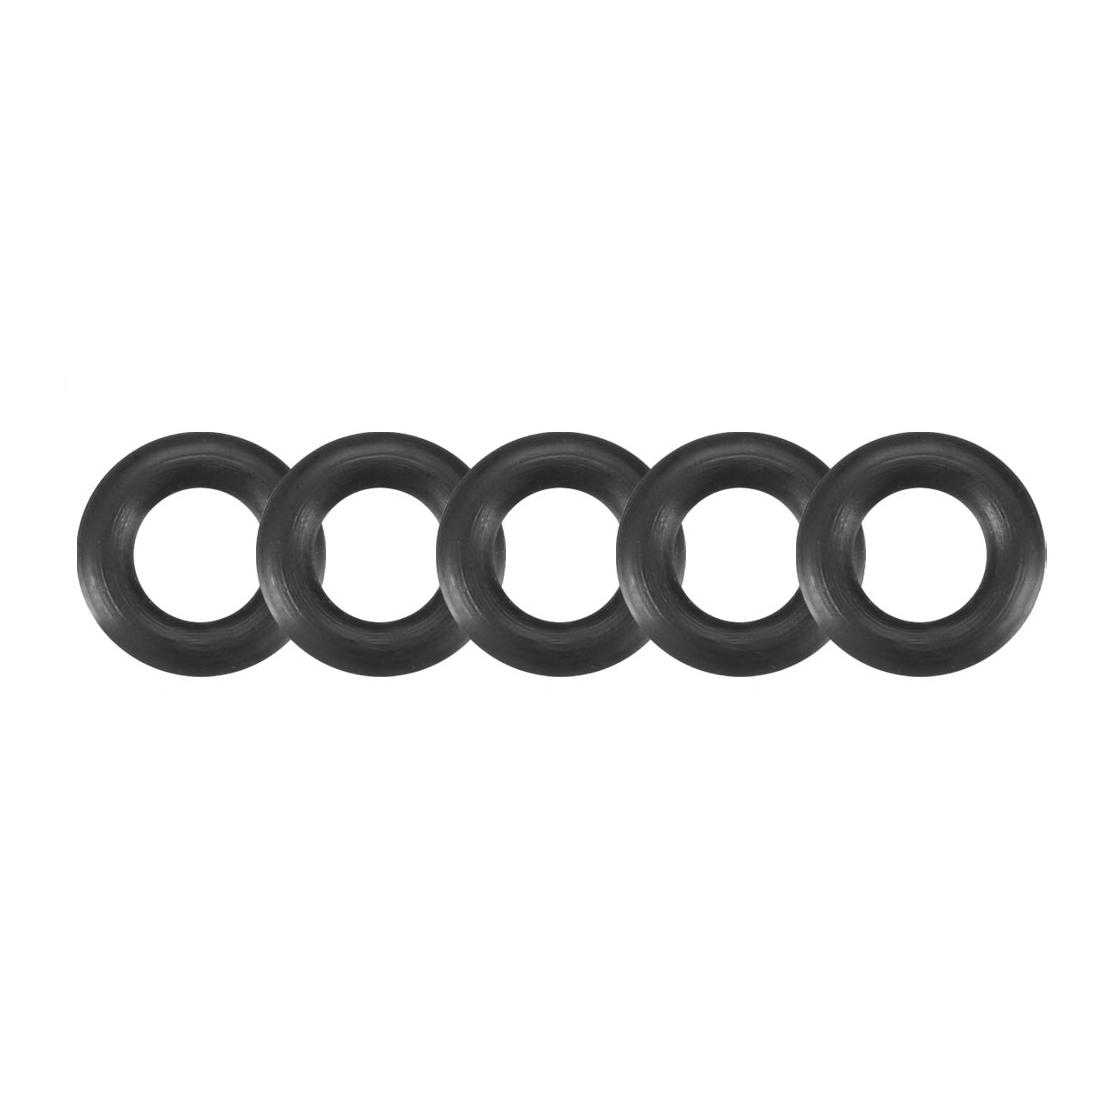 30 Pcs Black 8mm x 2mm Rubber Oil Resistant Sealing Ring O-shape Grommets